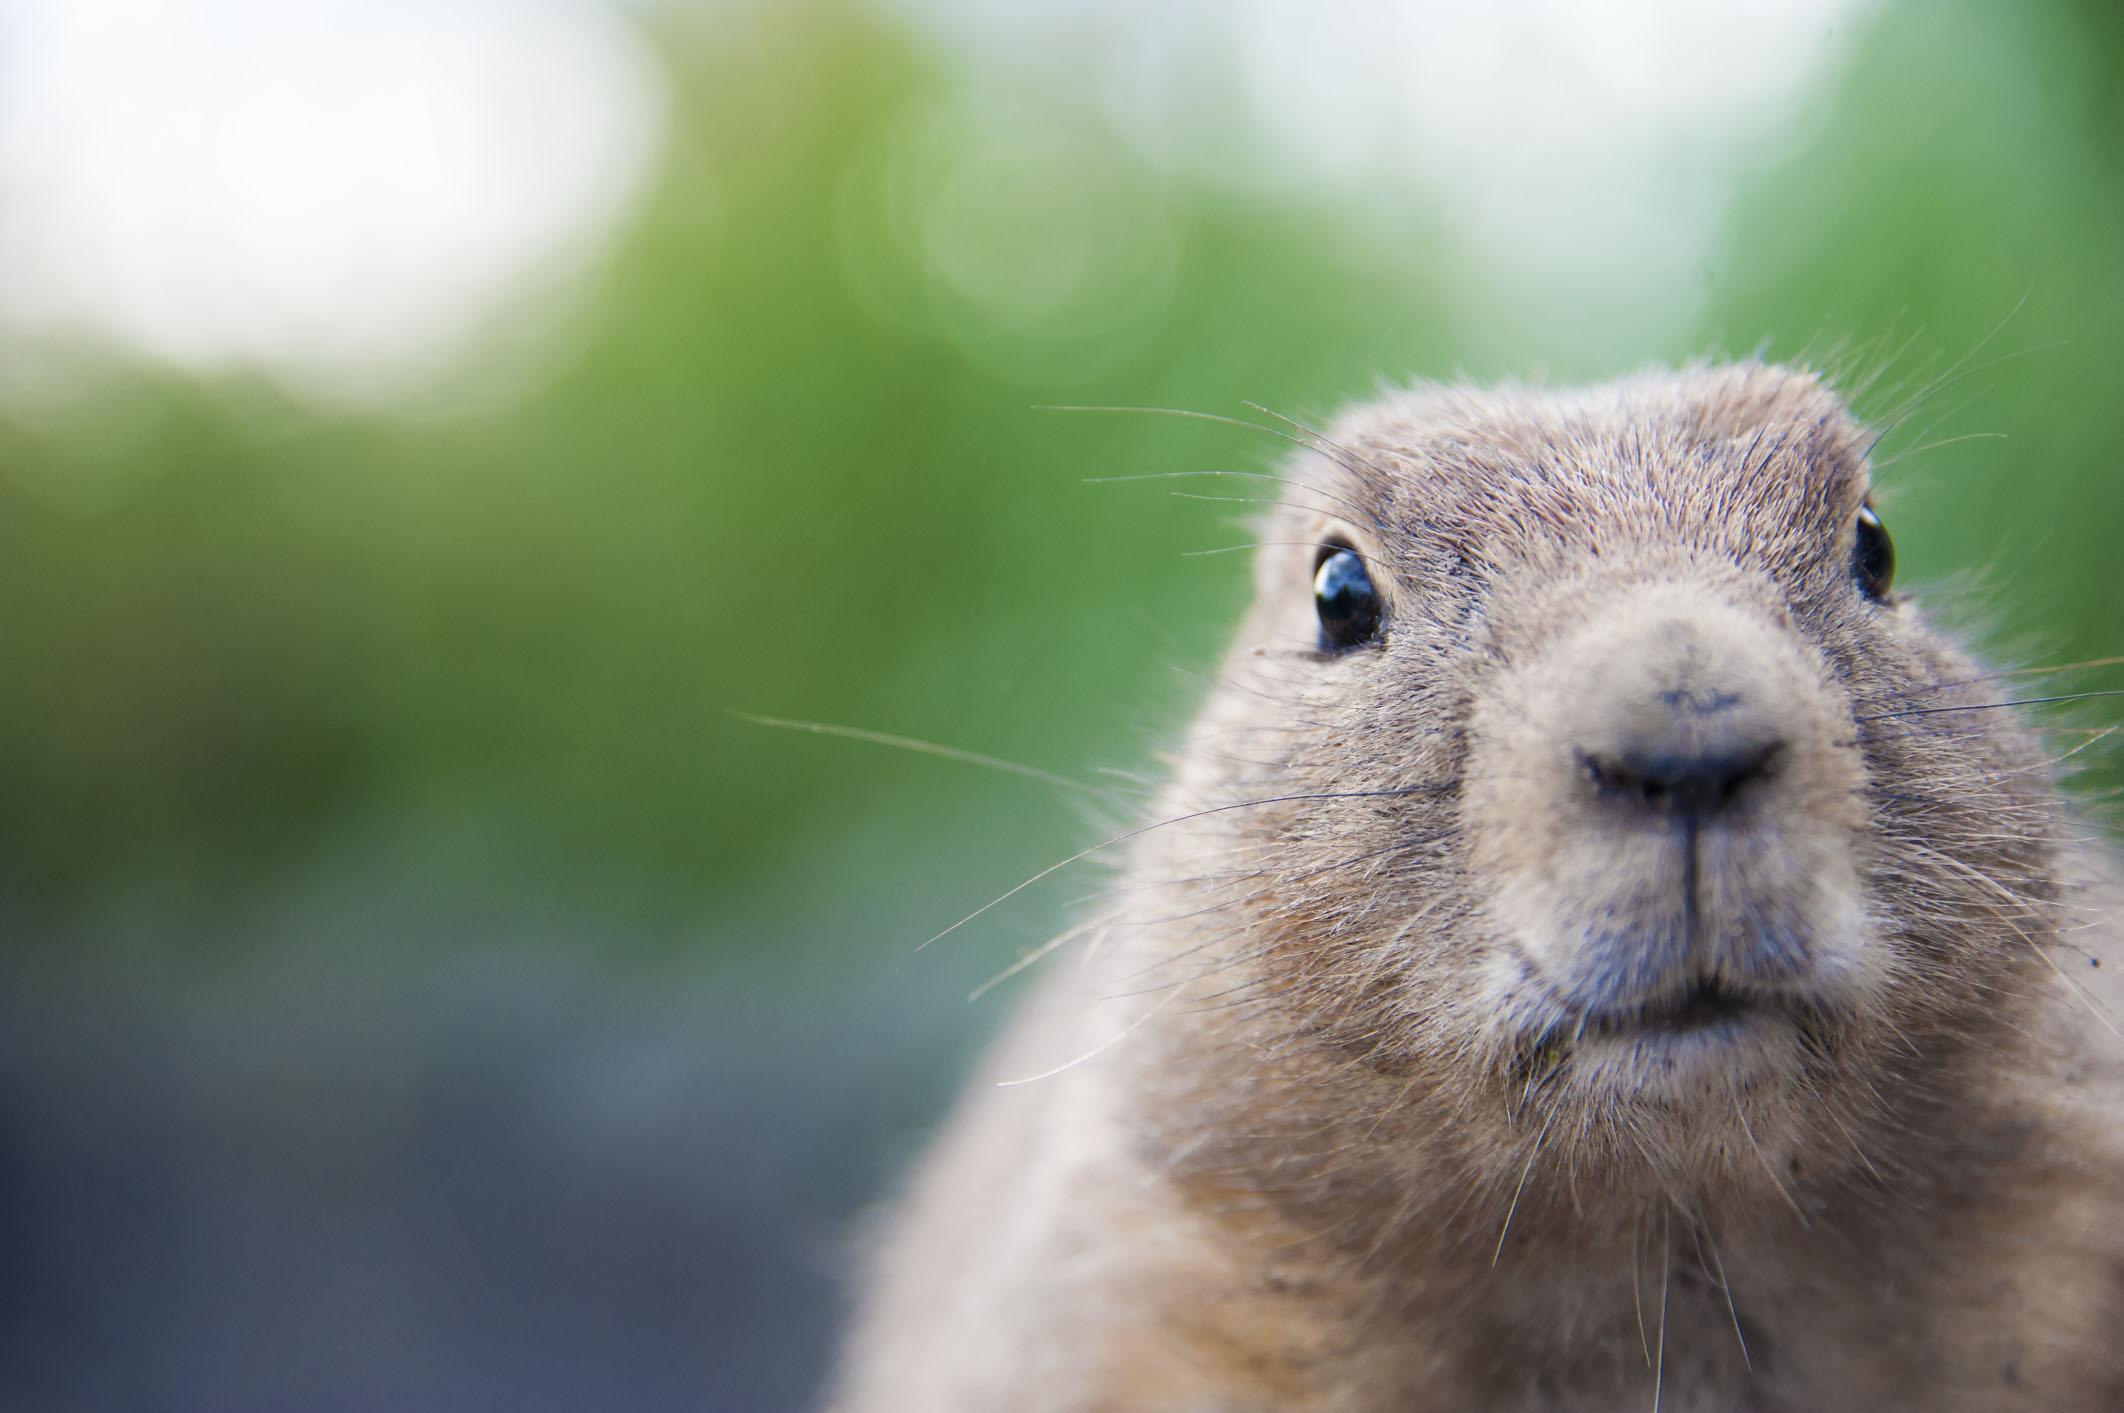 Garden Plot: Don't feed the ticks; send the woodchucks to Woodstock